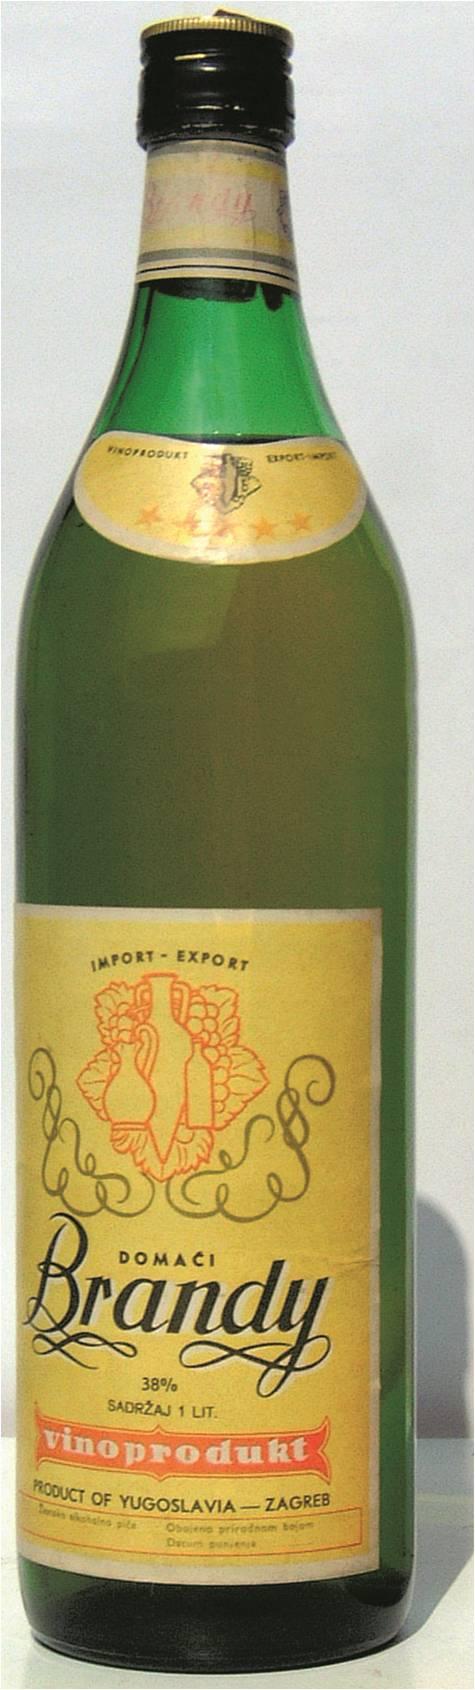 Domaći Brandy Vinoprodukt oko 1970 Kako je Brandy domaći postao brend, pa Brand No 1